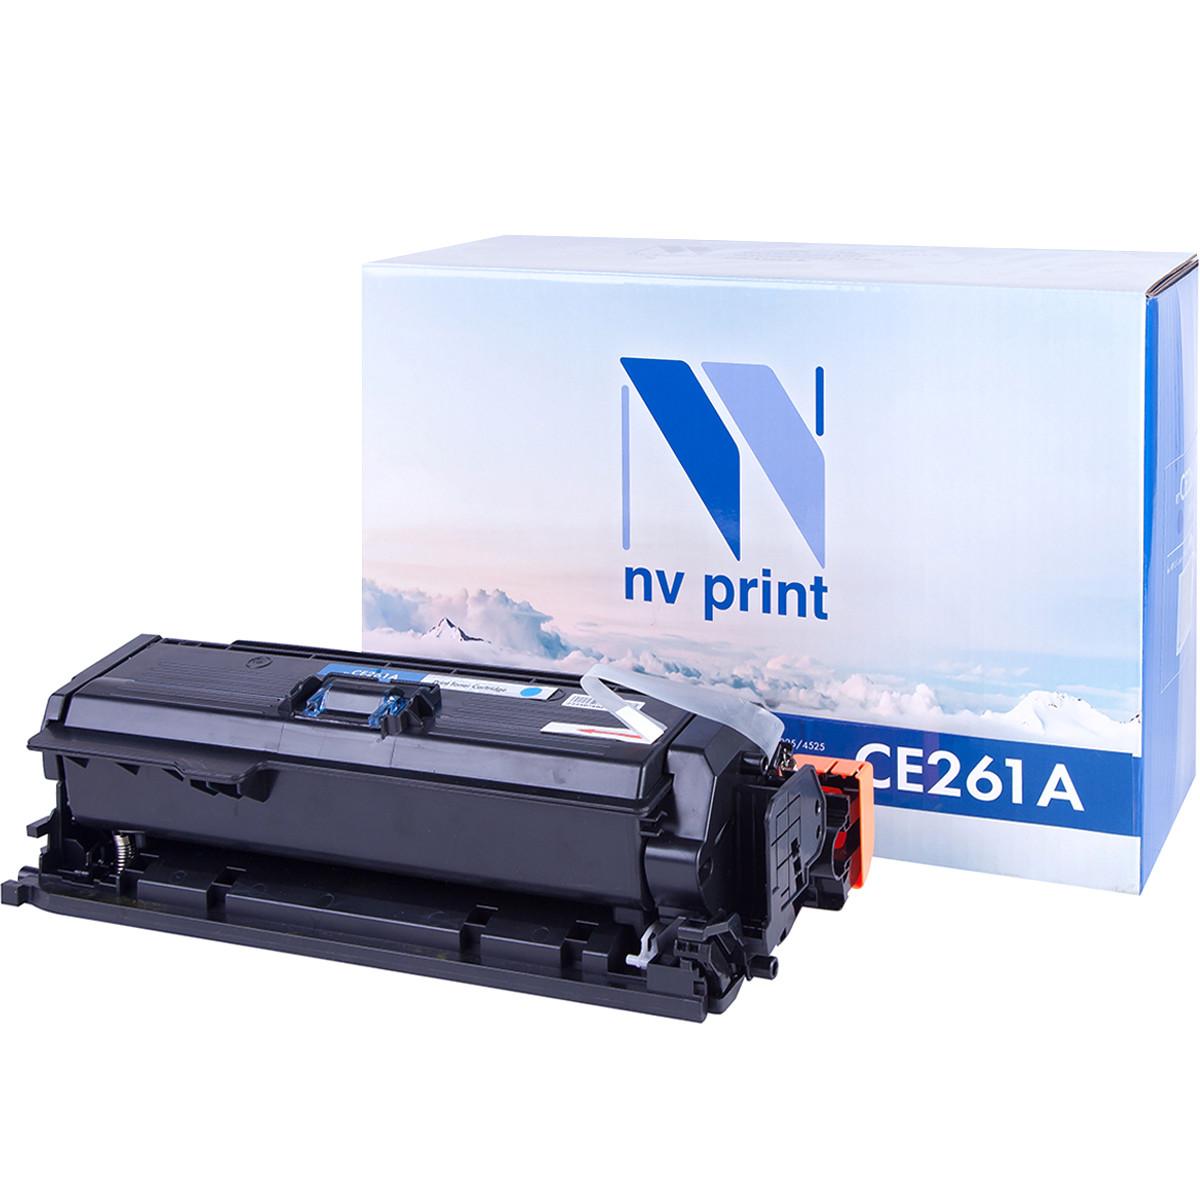 Картридж NVP совместимый HP CE261A Cyan для LaserJet Color CP4025dn/CP4025n/CP4525dn/CP4525n/CP4525x